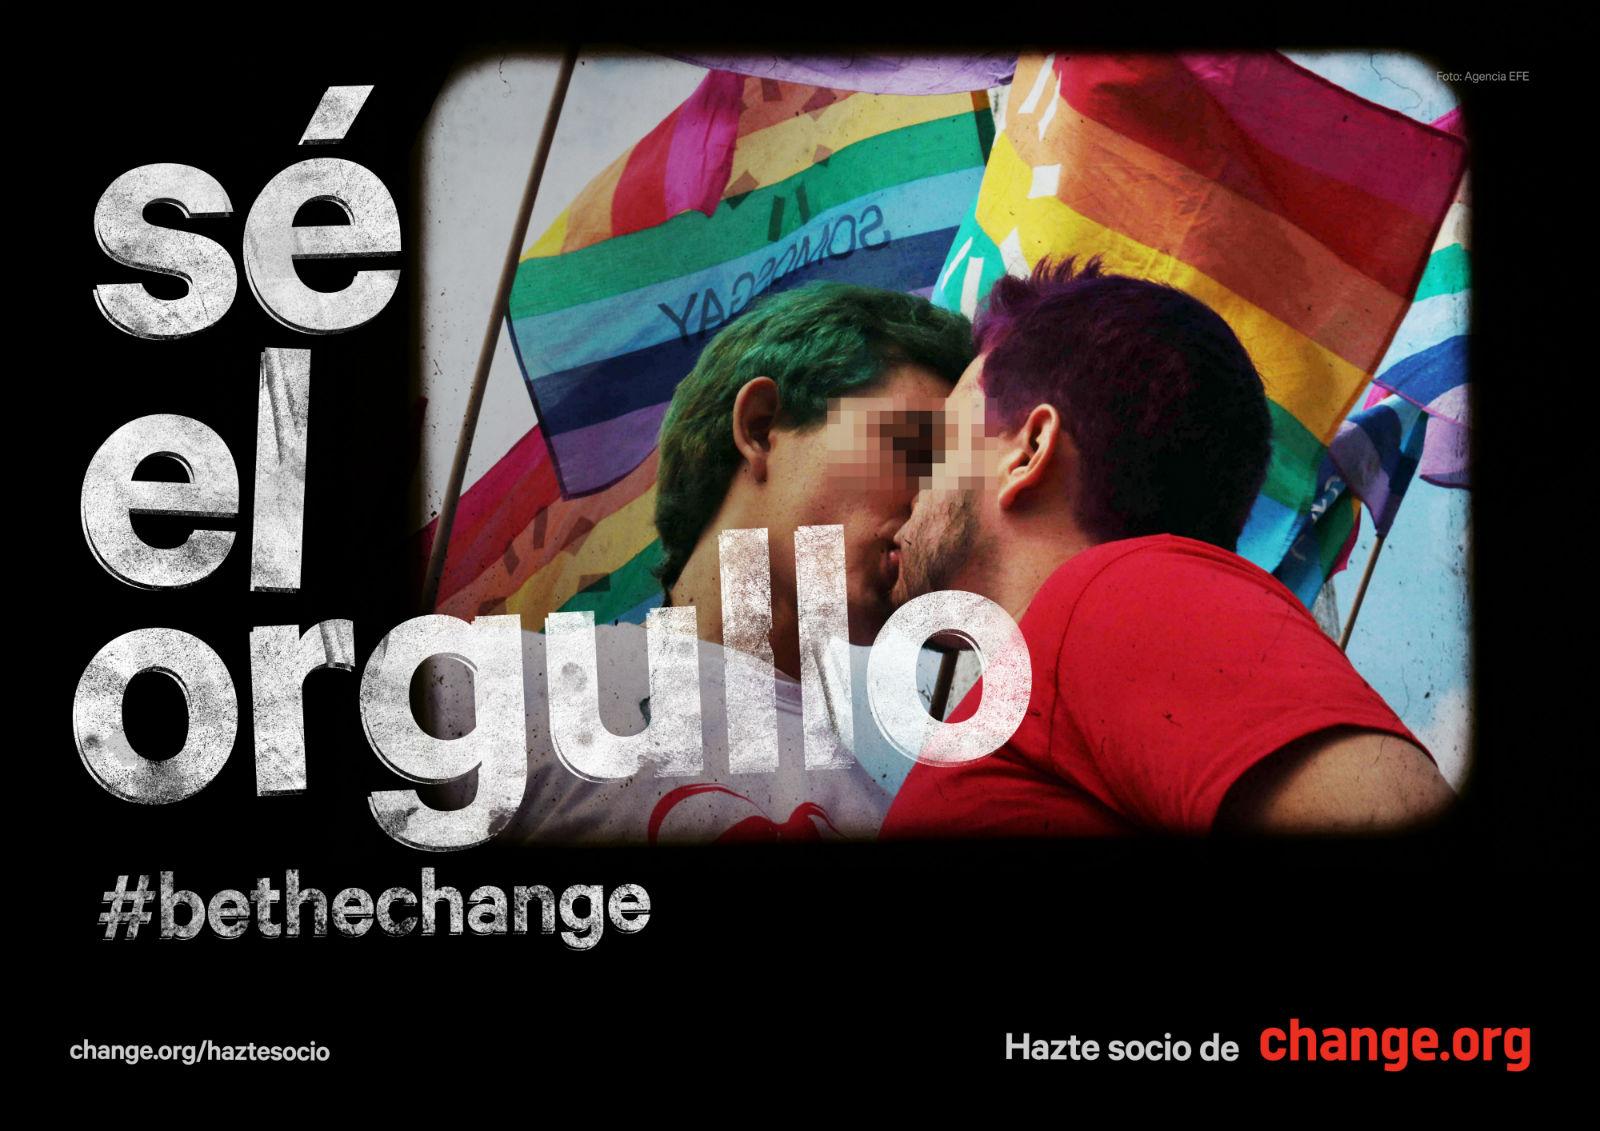 Change.org orgullo gráfica